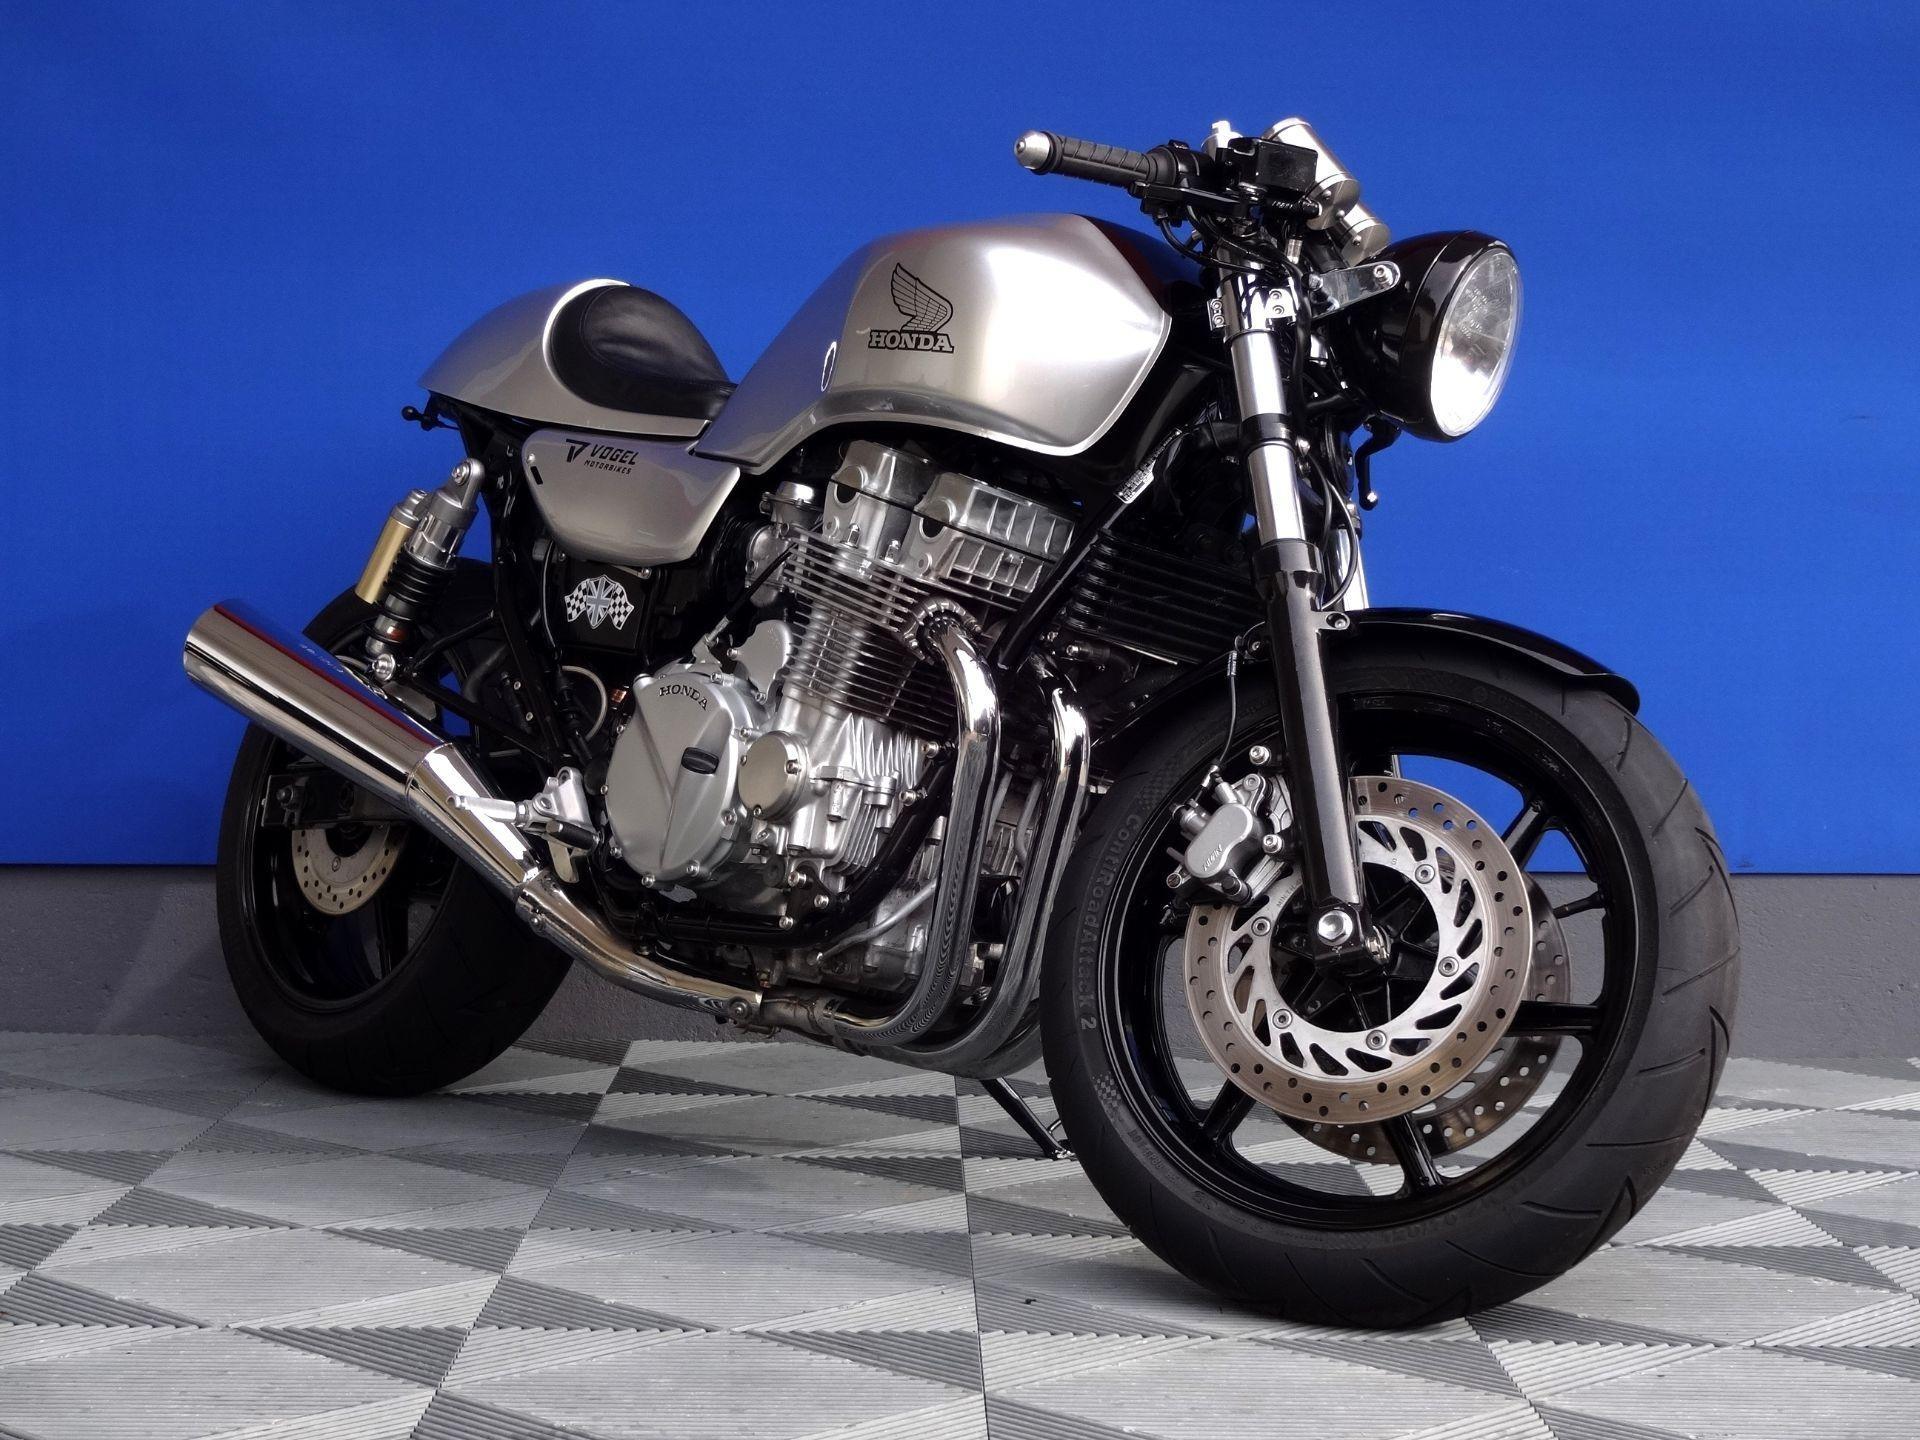 Honda Cb 750 F2 Seven Fifty Cafe Racer Vogel Motorbikes